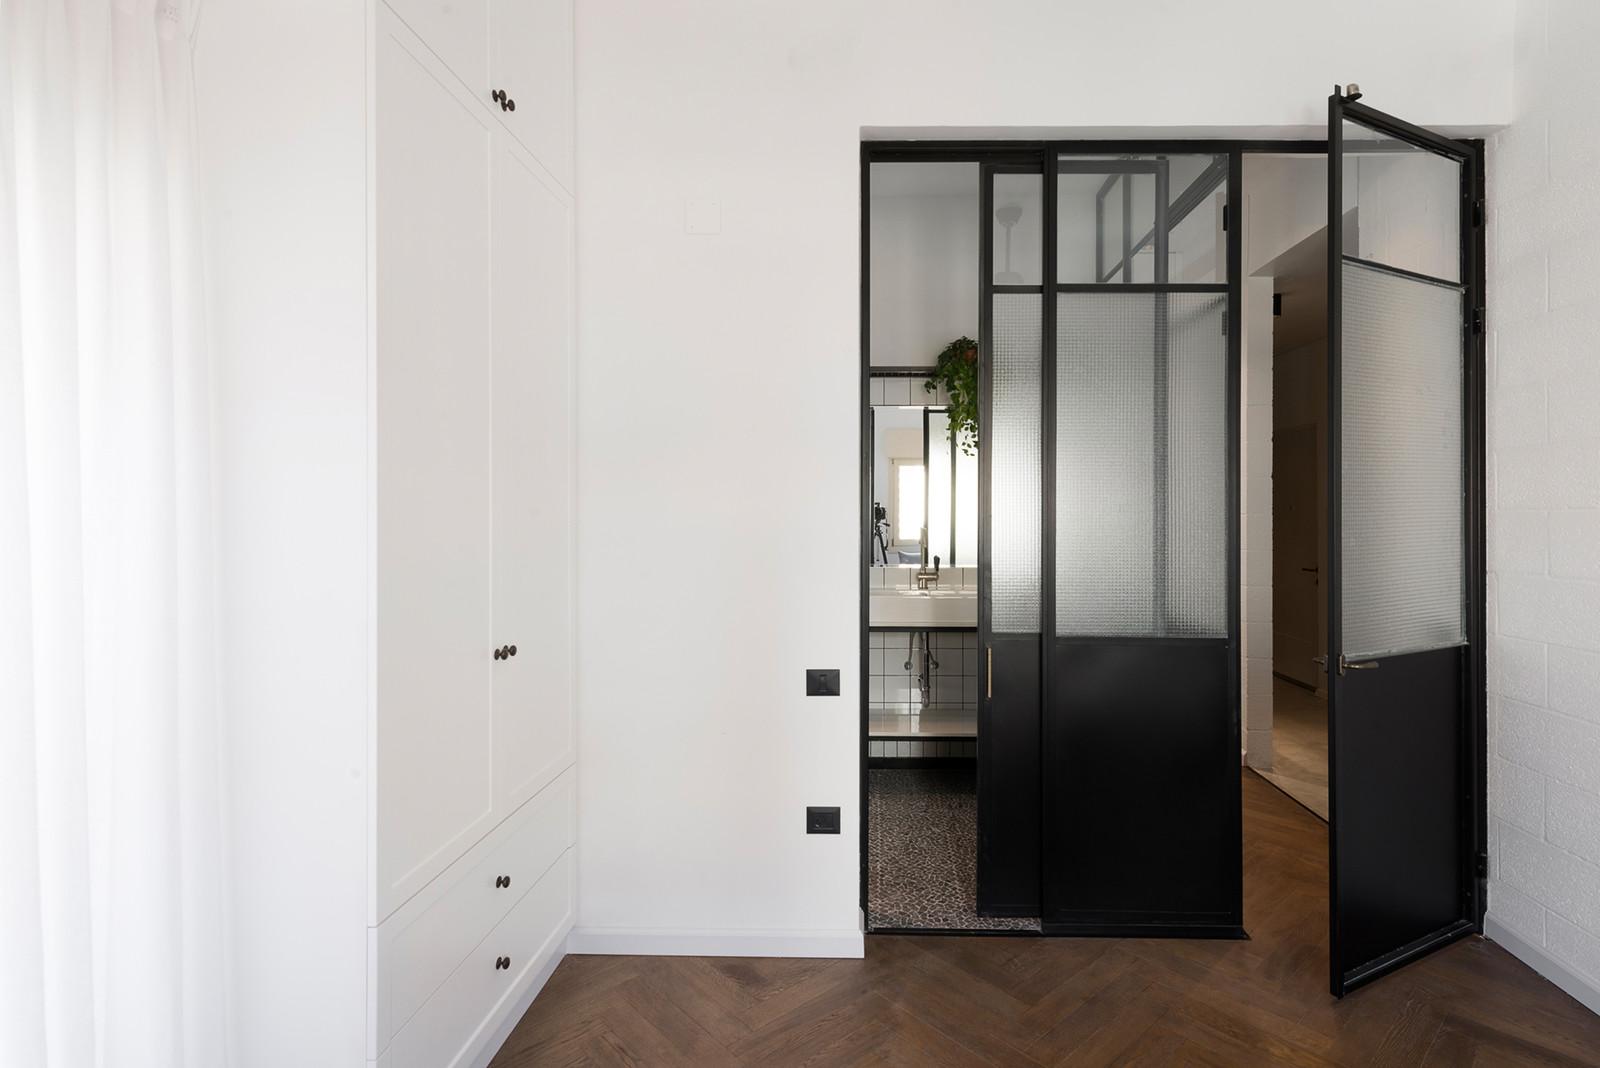 Apartment-renovation-just3ds.com-18